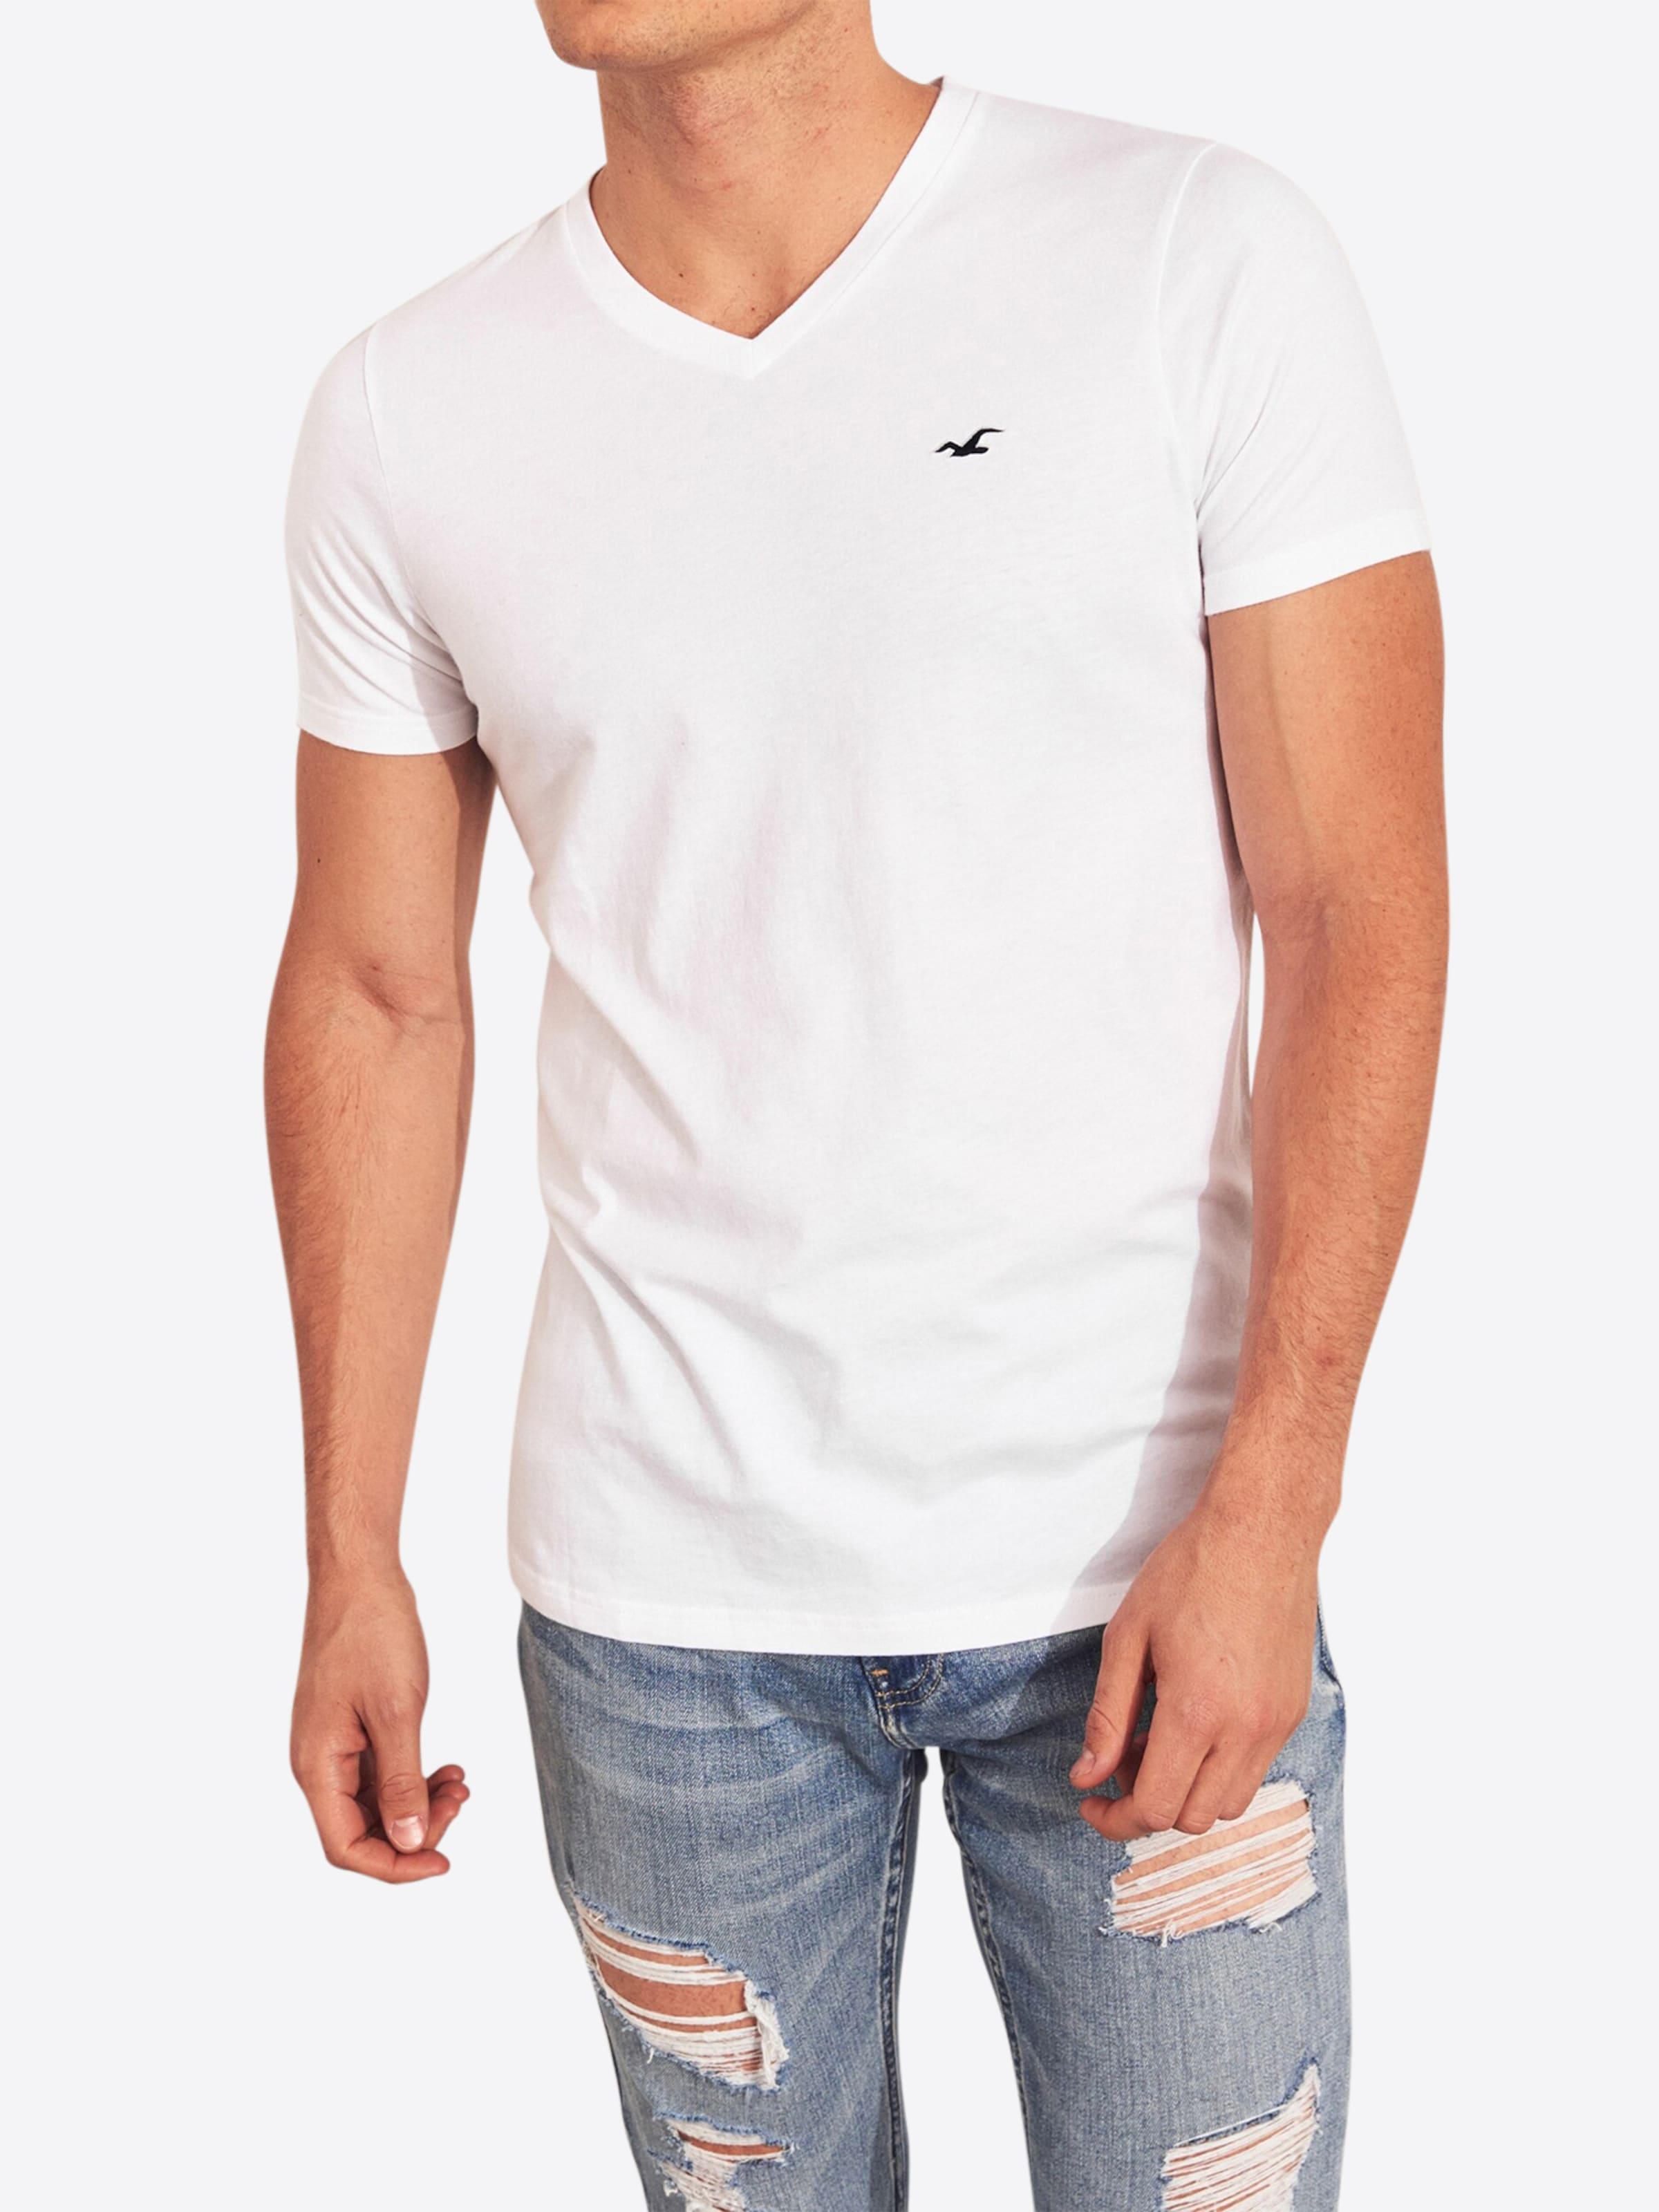 shirt Hollister shirt Weiß T Hollister T In u1cKlF35TJ